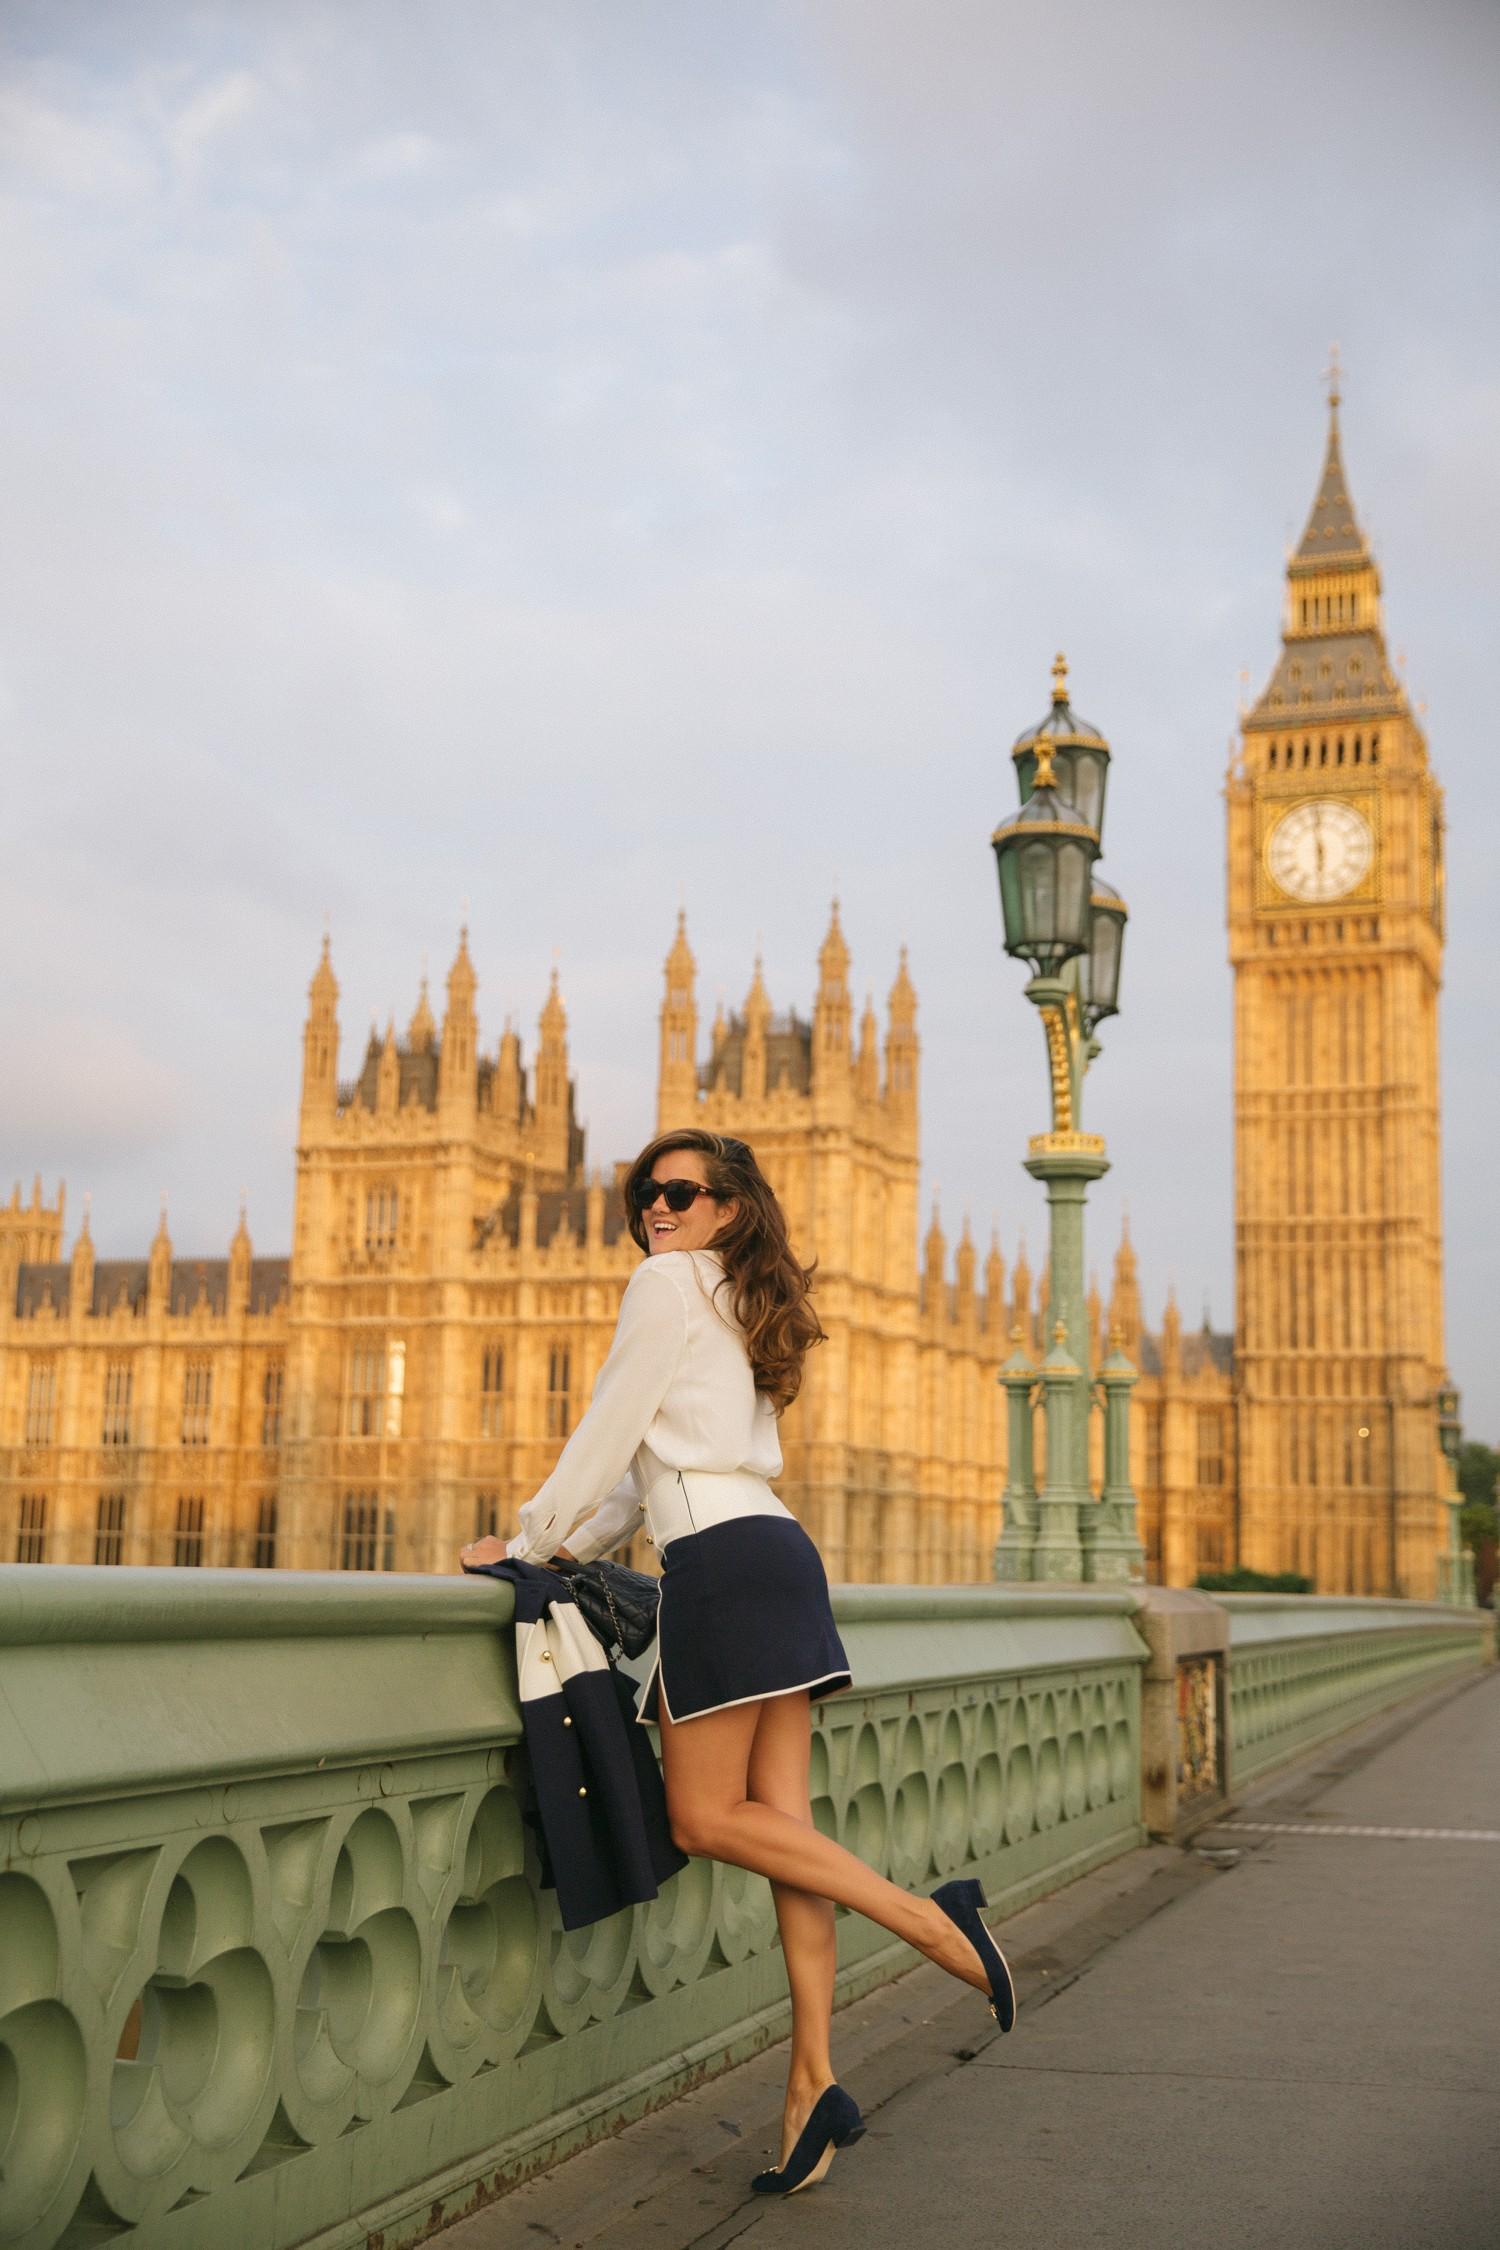 Sunrise Tour of London